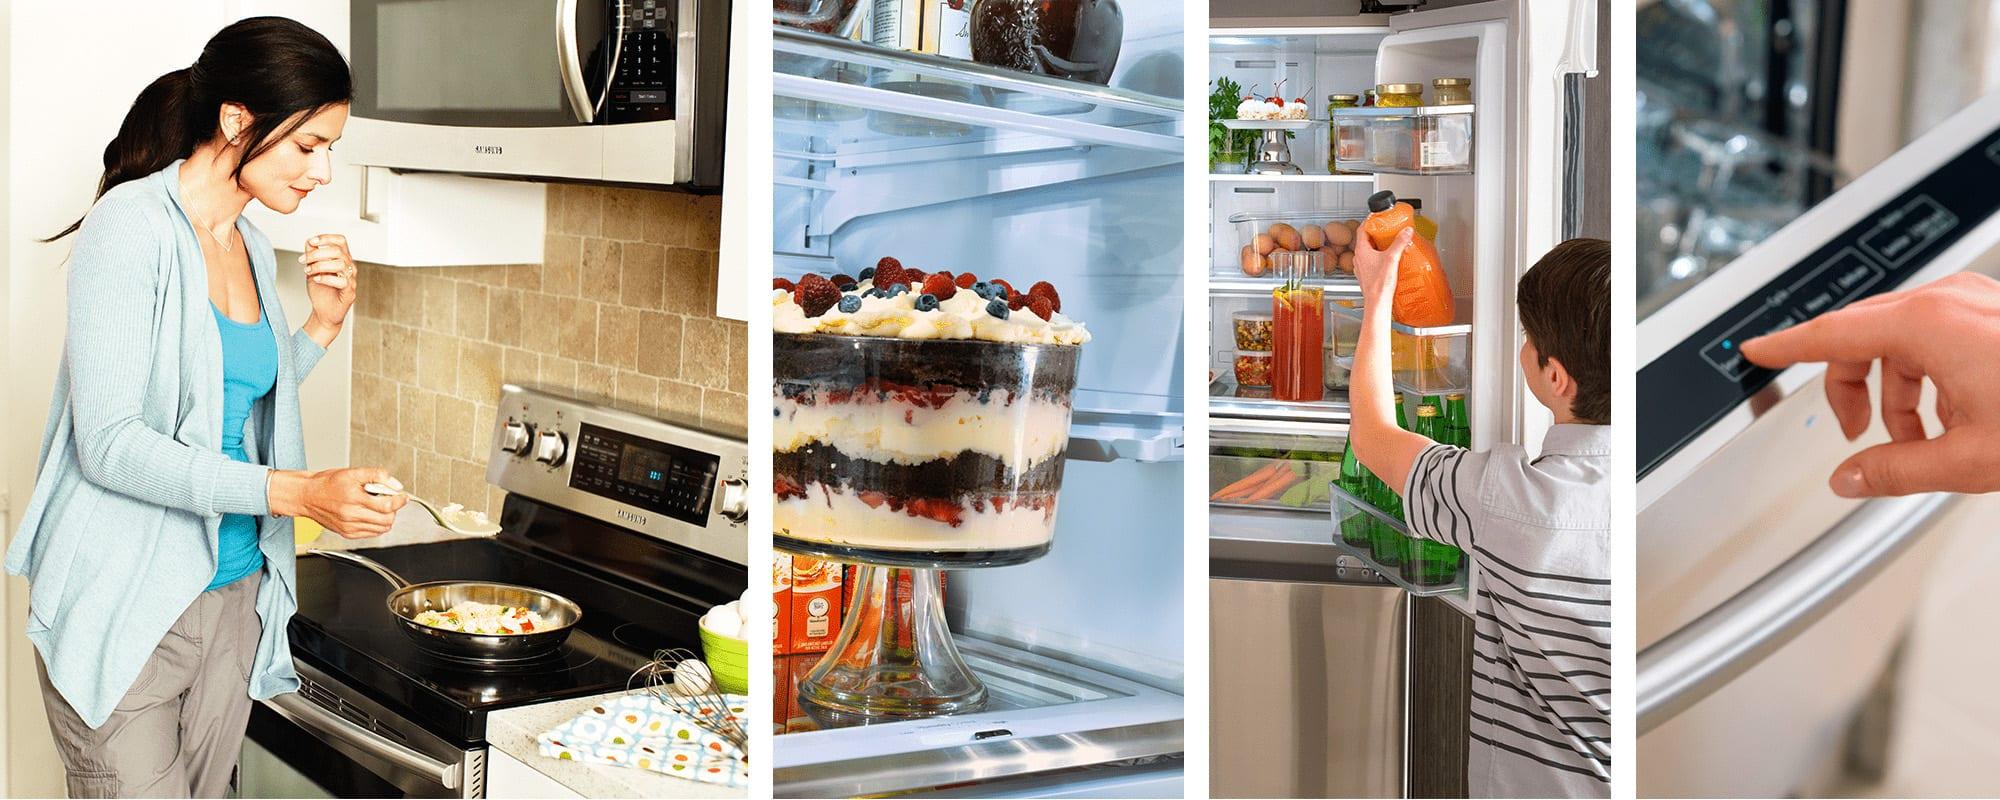 Samsung Appliances Lifestyle Collage